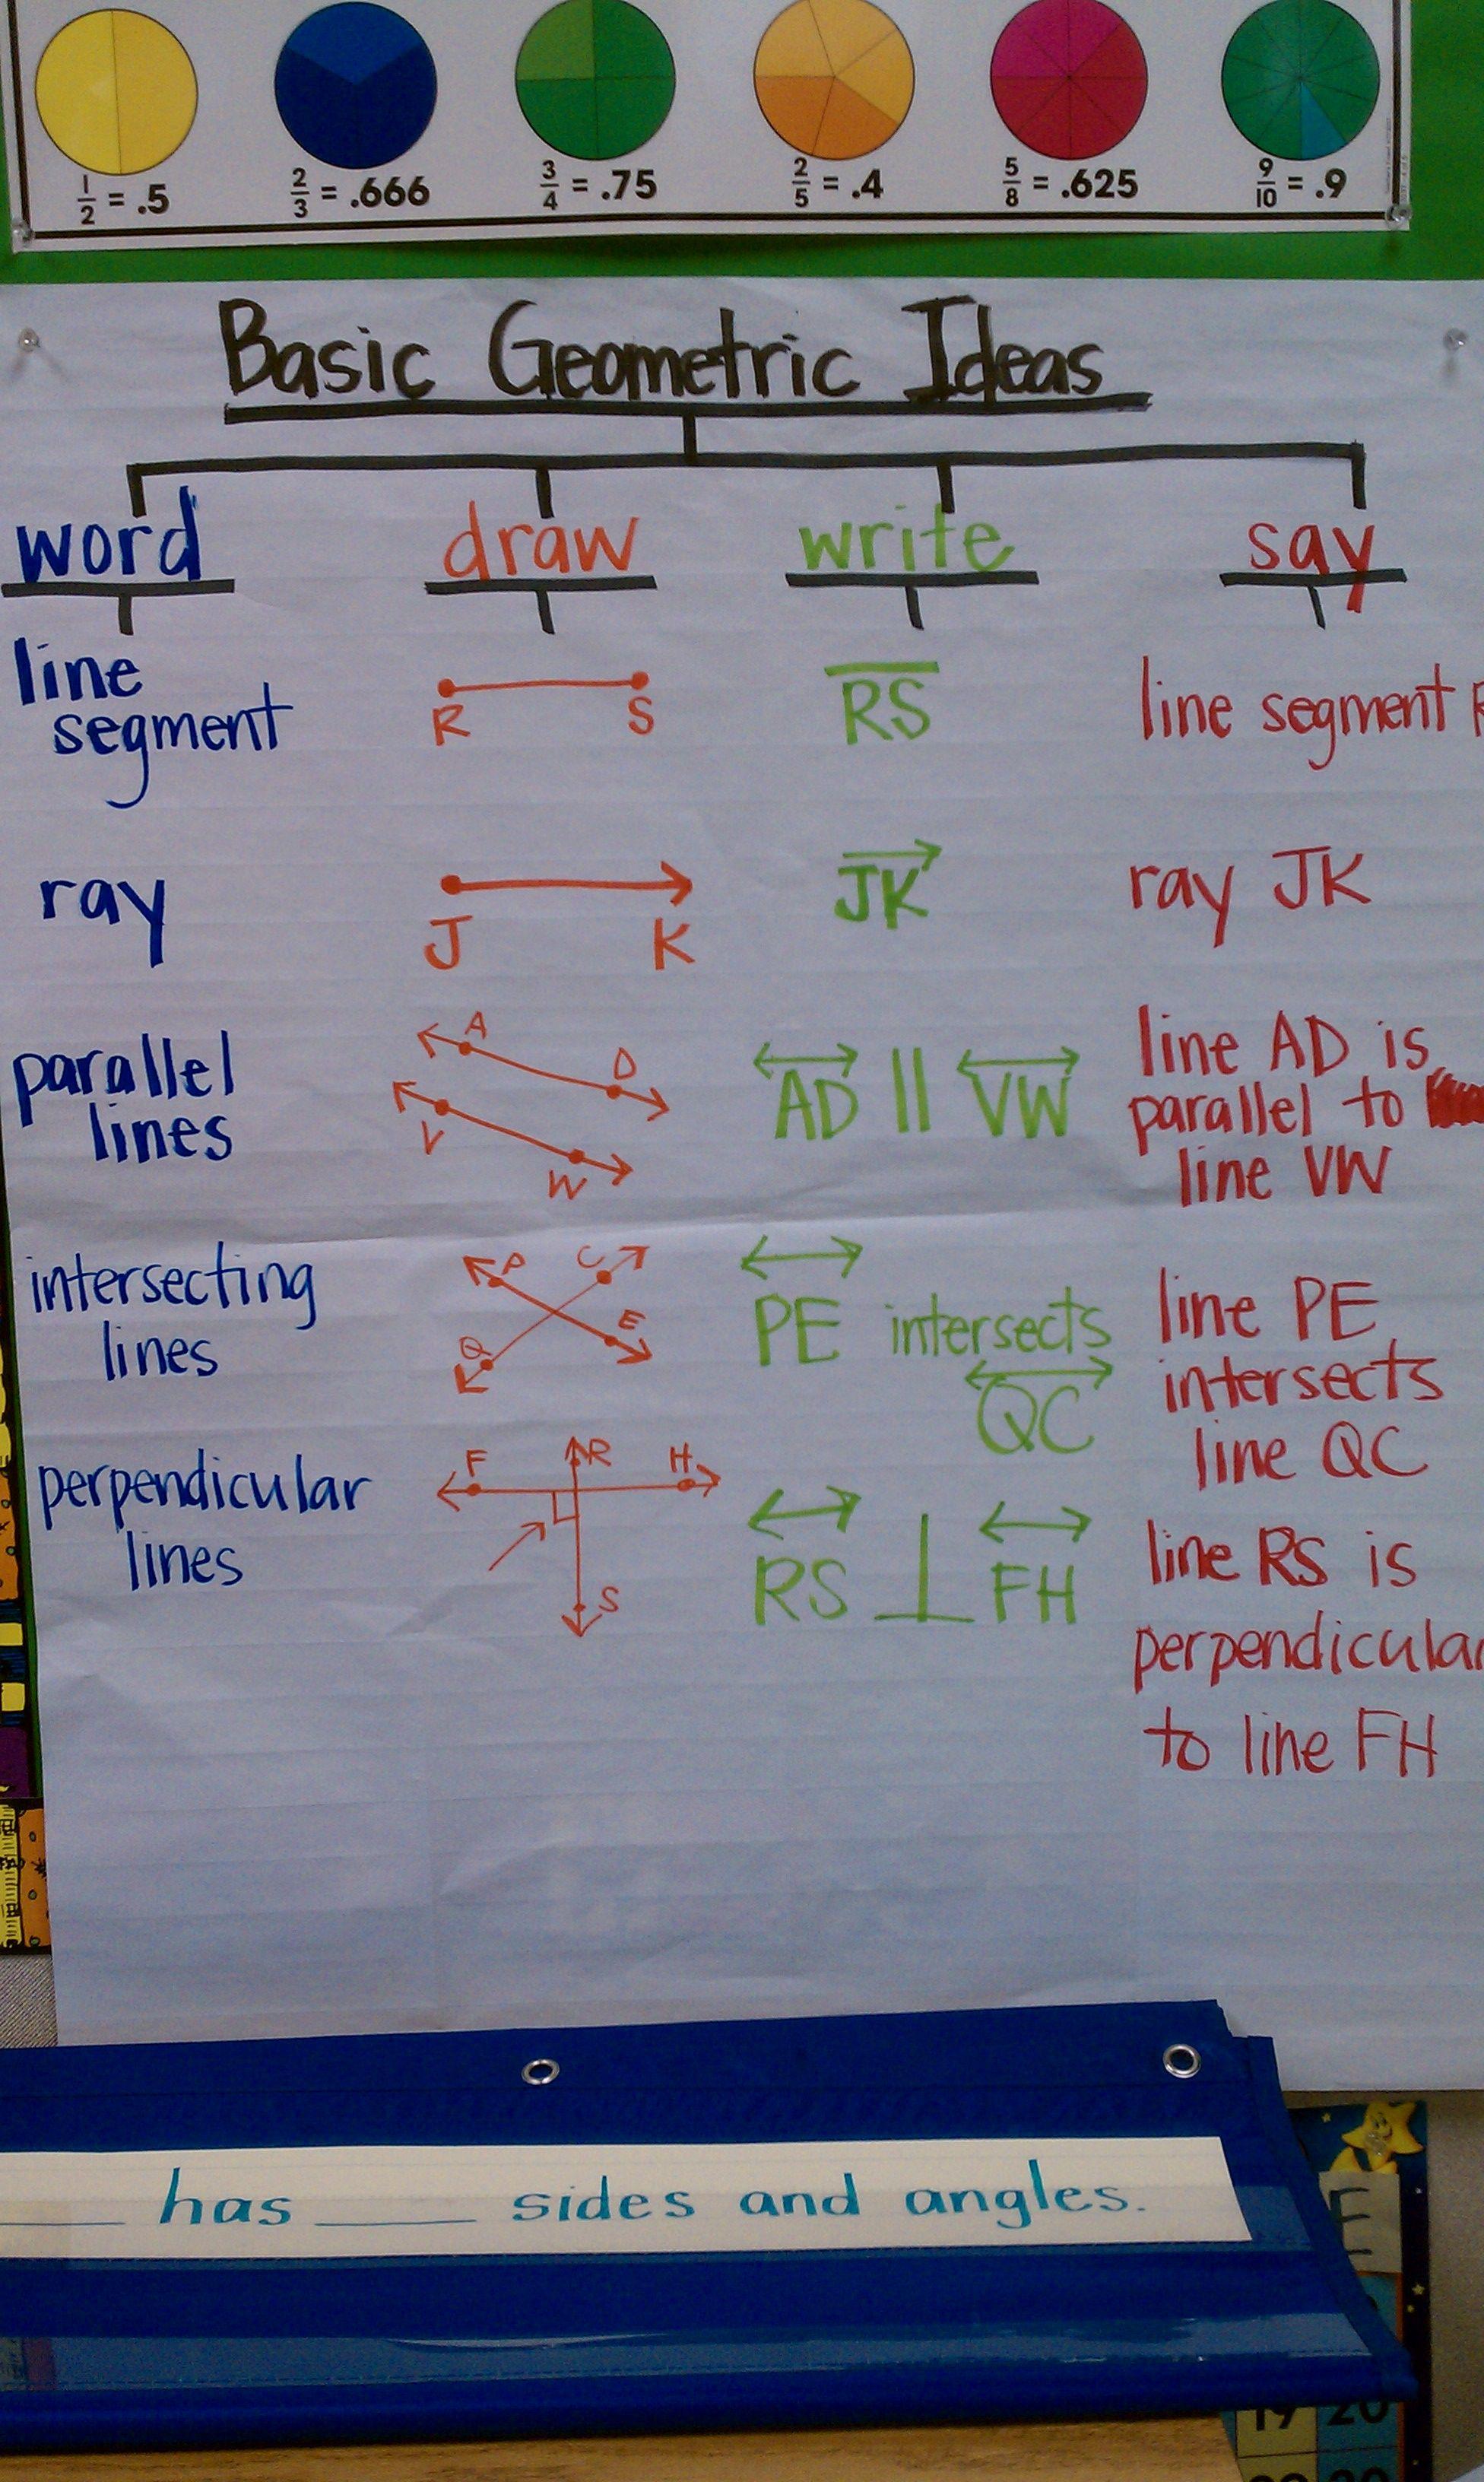 worksheet Geometric Ideas Worksheet basic geometric ideas 5th grade tree map education mathematics map